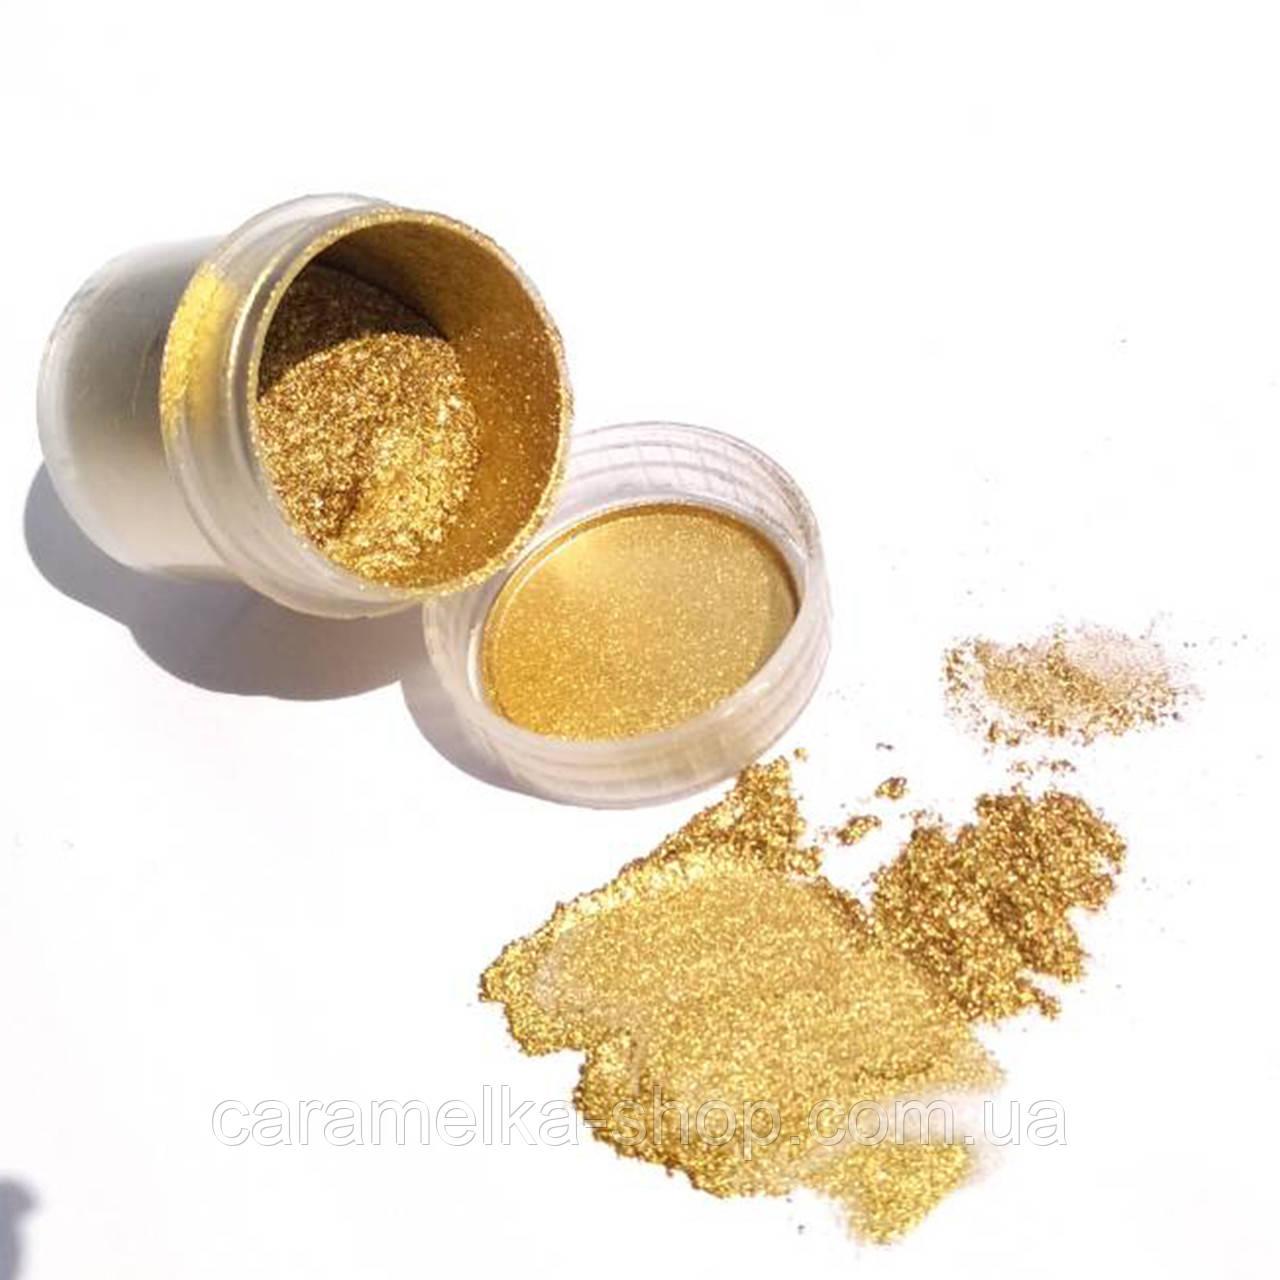 Кандурин античне Золото, золота іскра. Італія.